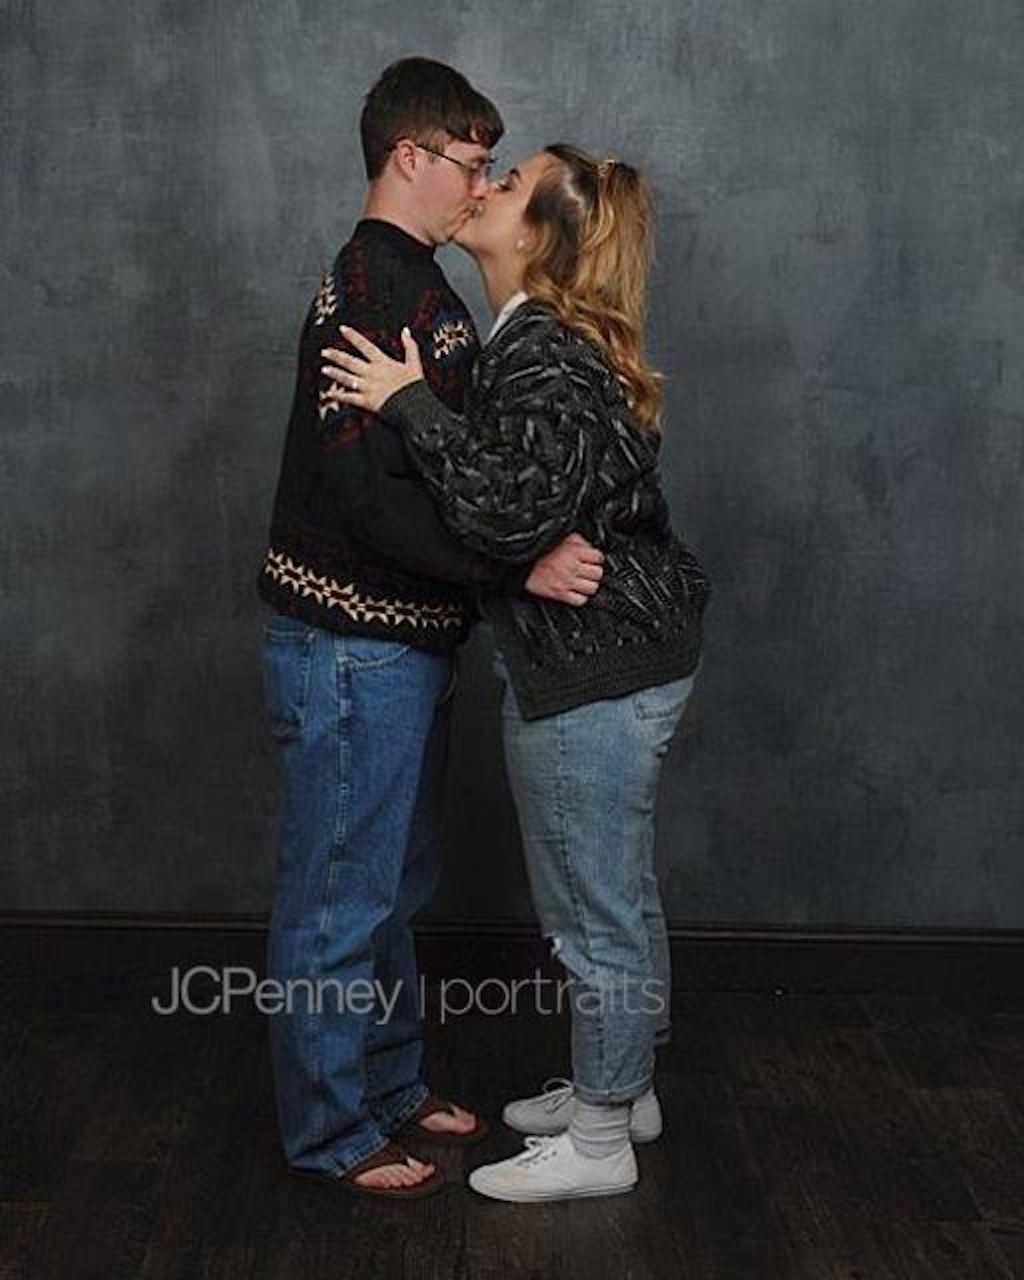 JC Penny engagement photo shoot